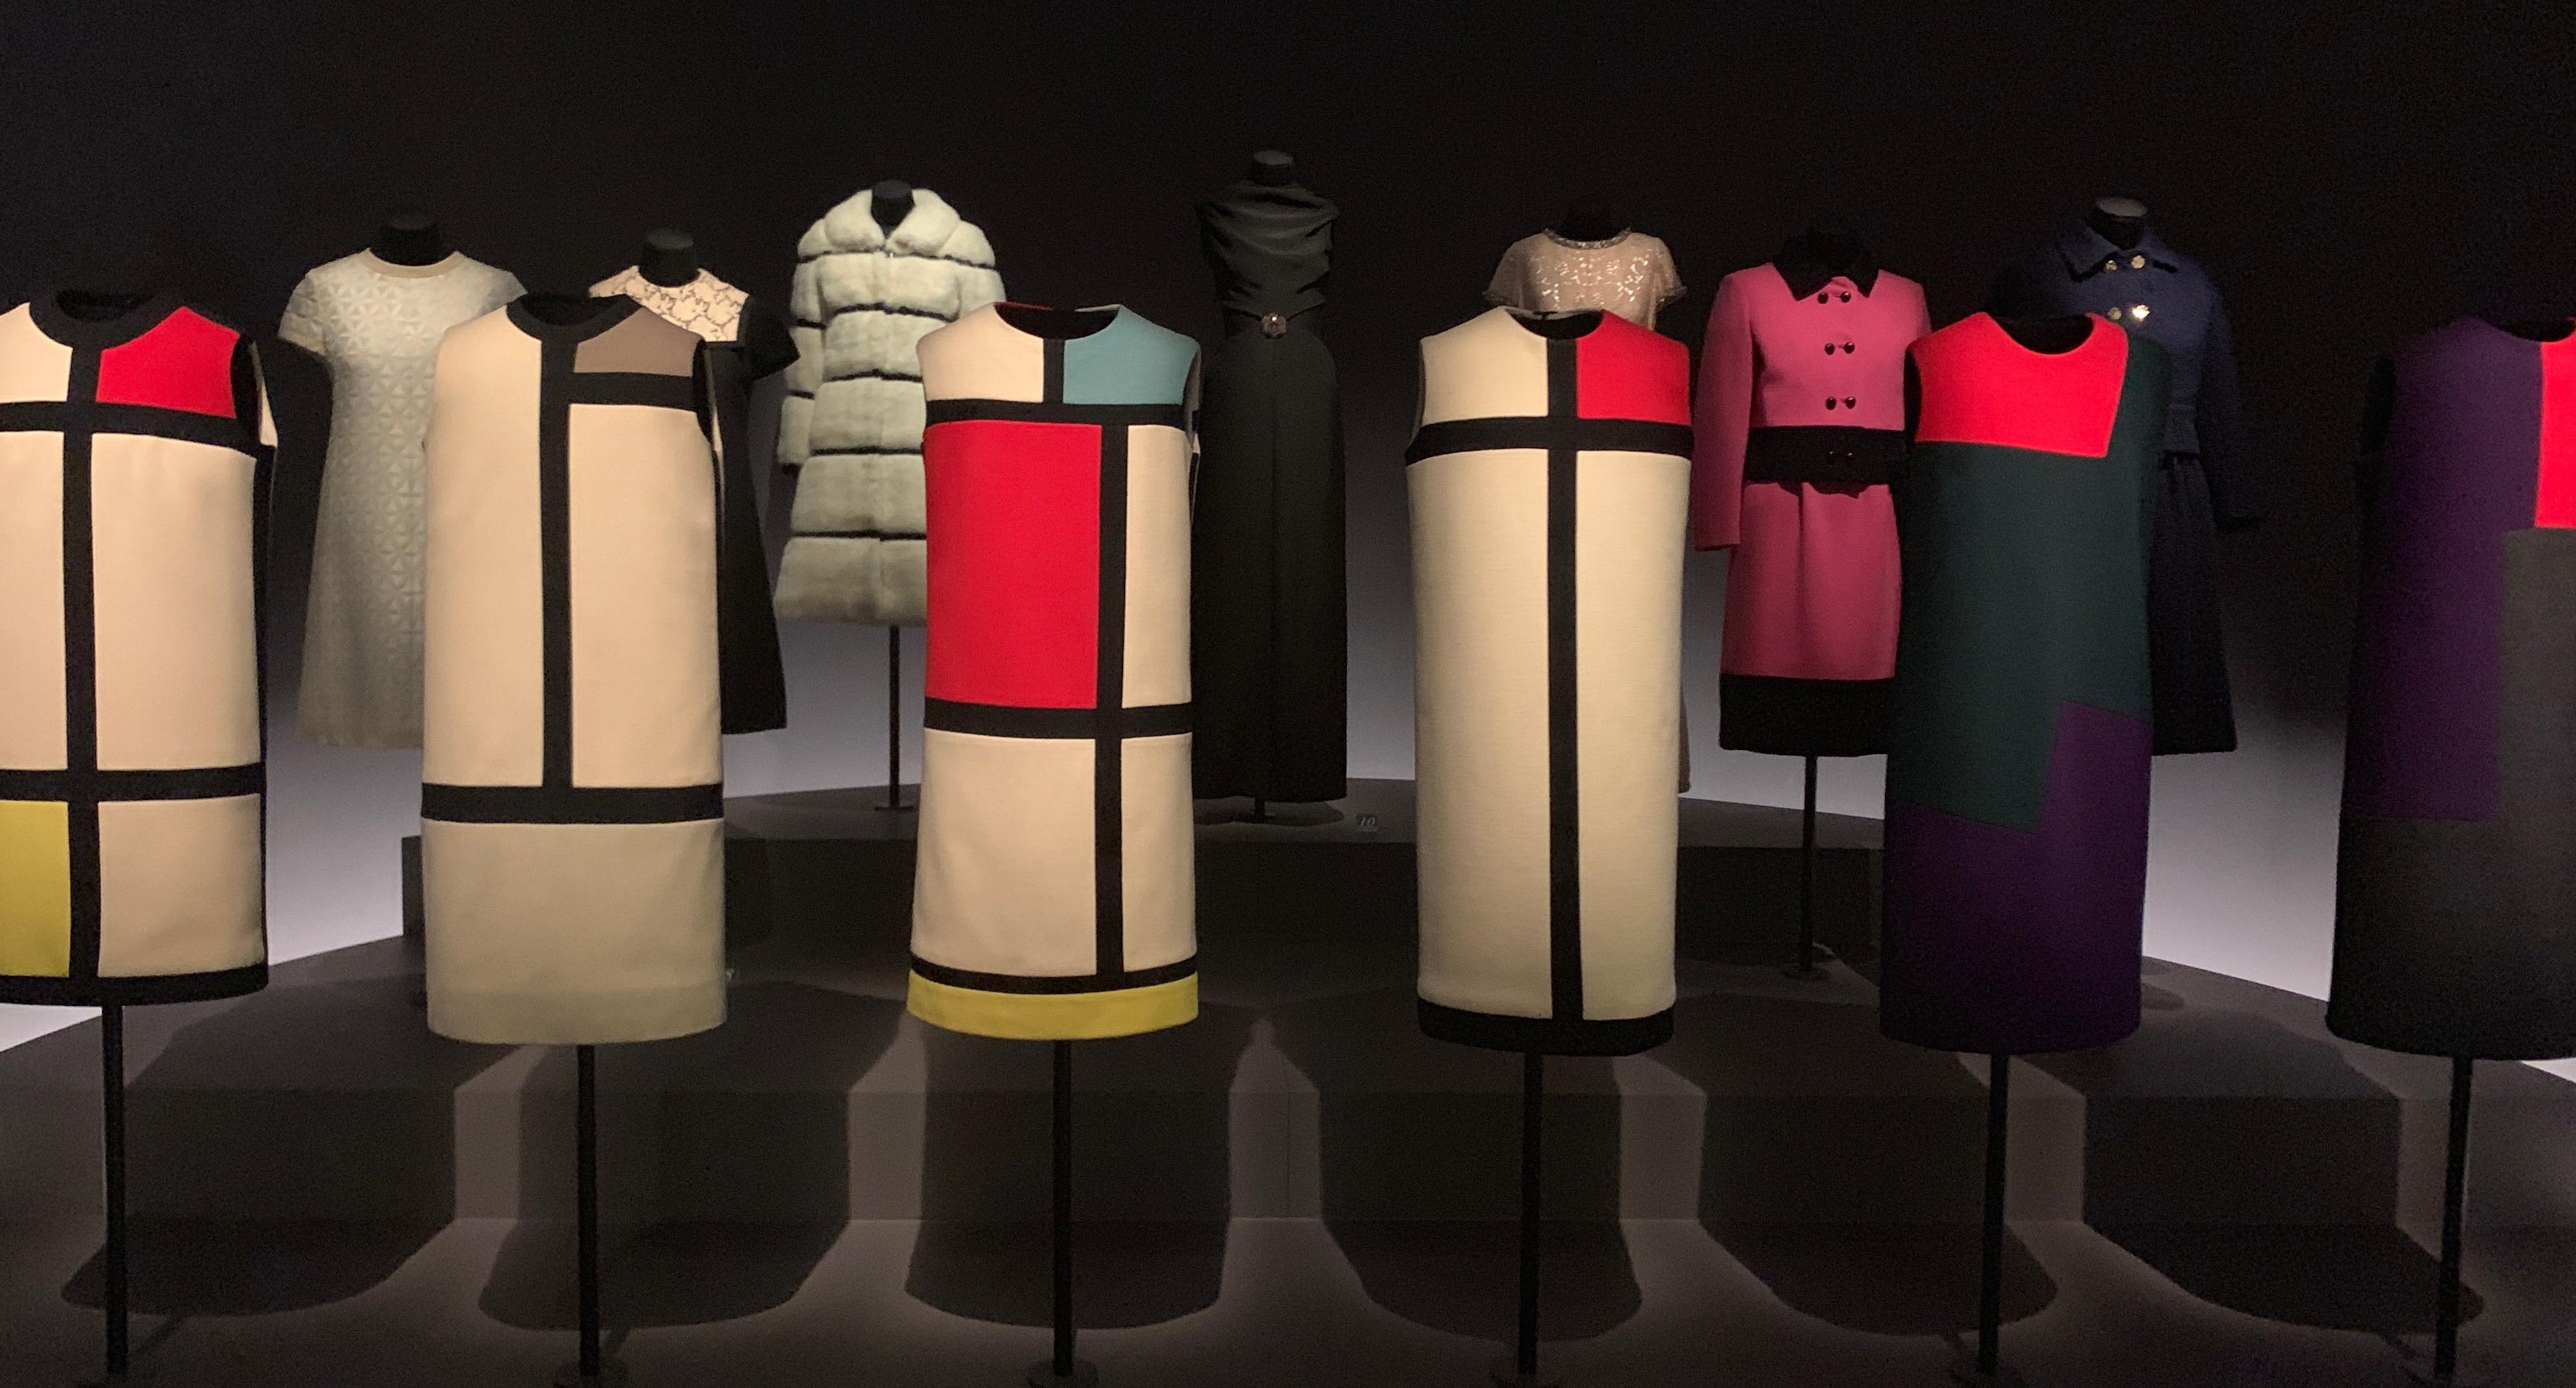 Yves Saint Laurent Mondrian Collection 1965. Image Credit/Liza Cameron